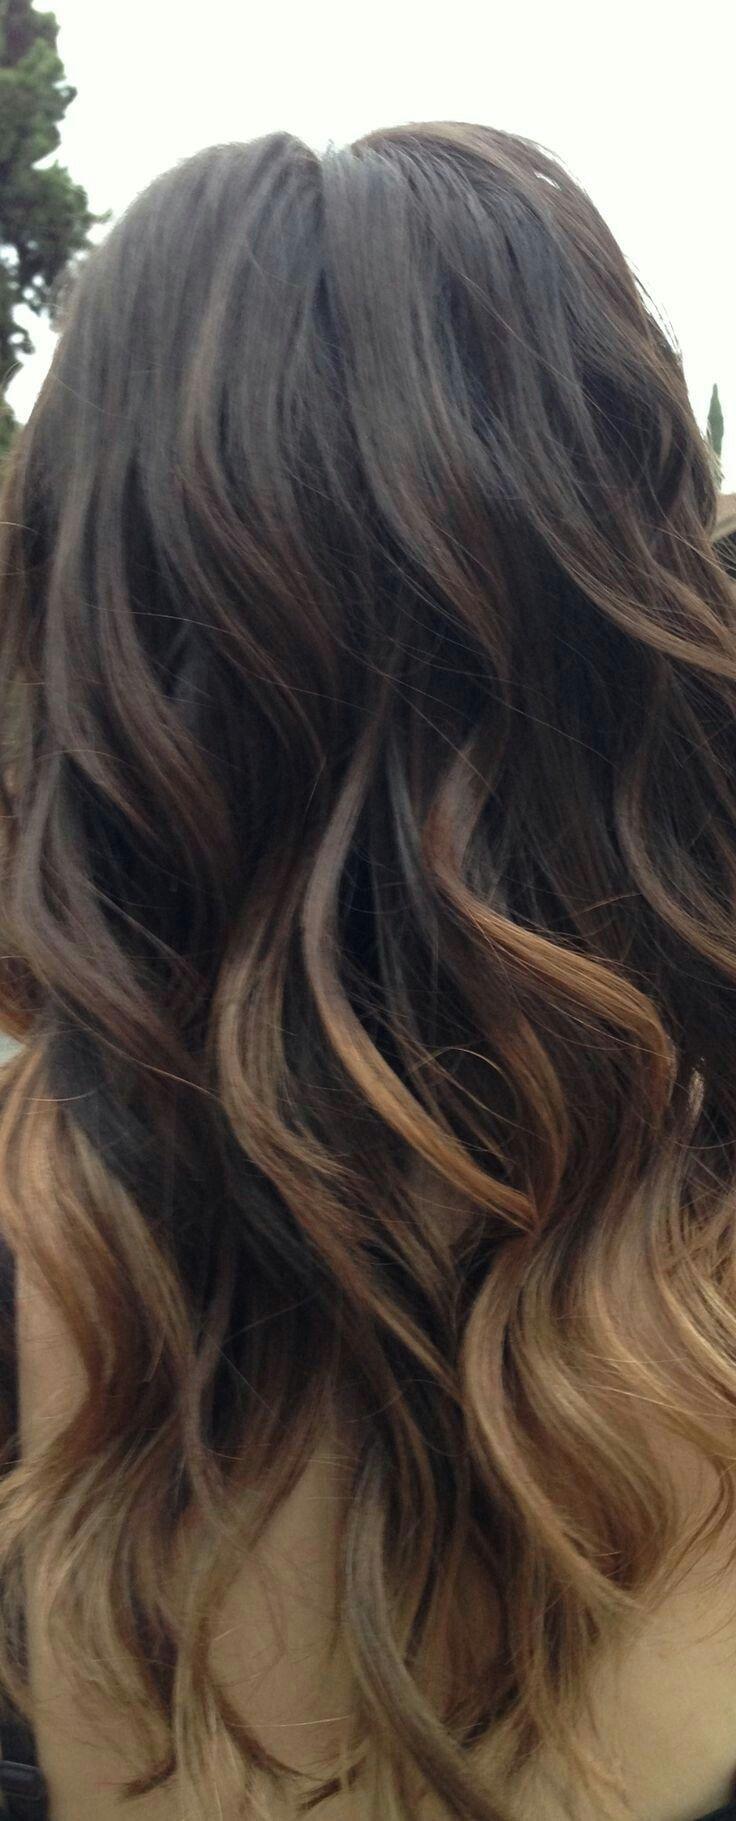 Best 25+ Ombre for dark hair ideas on Pinterest | Dark ...